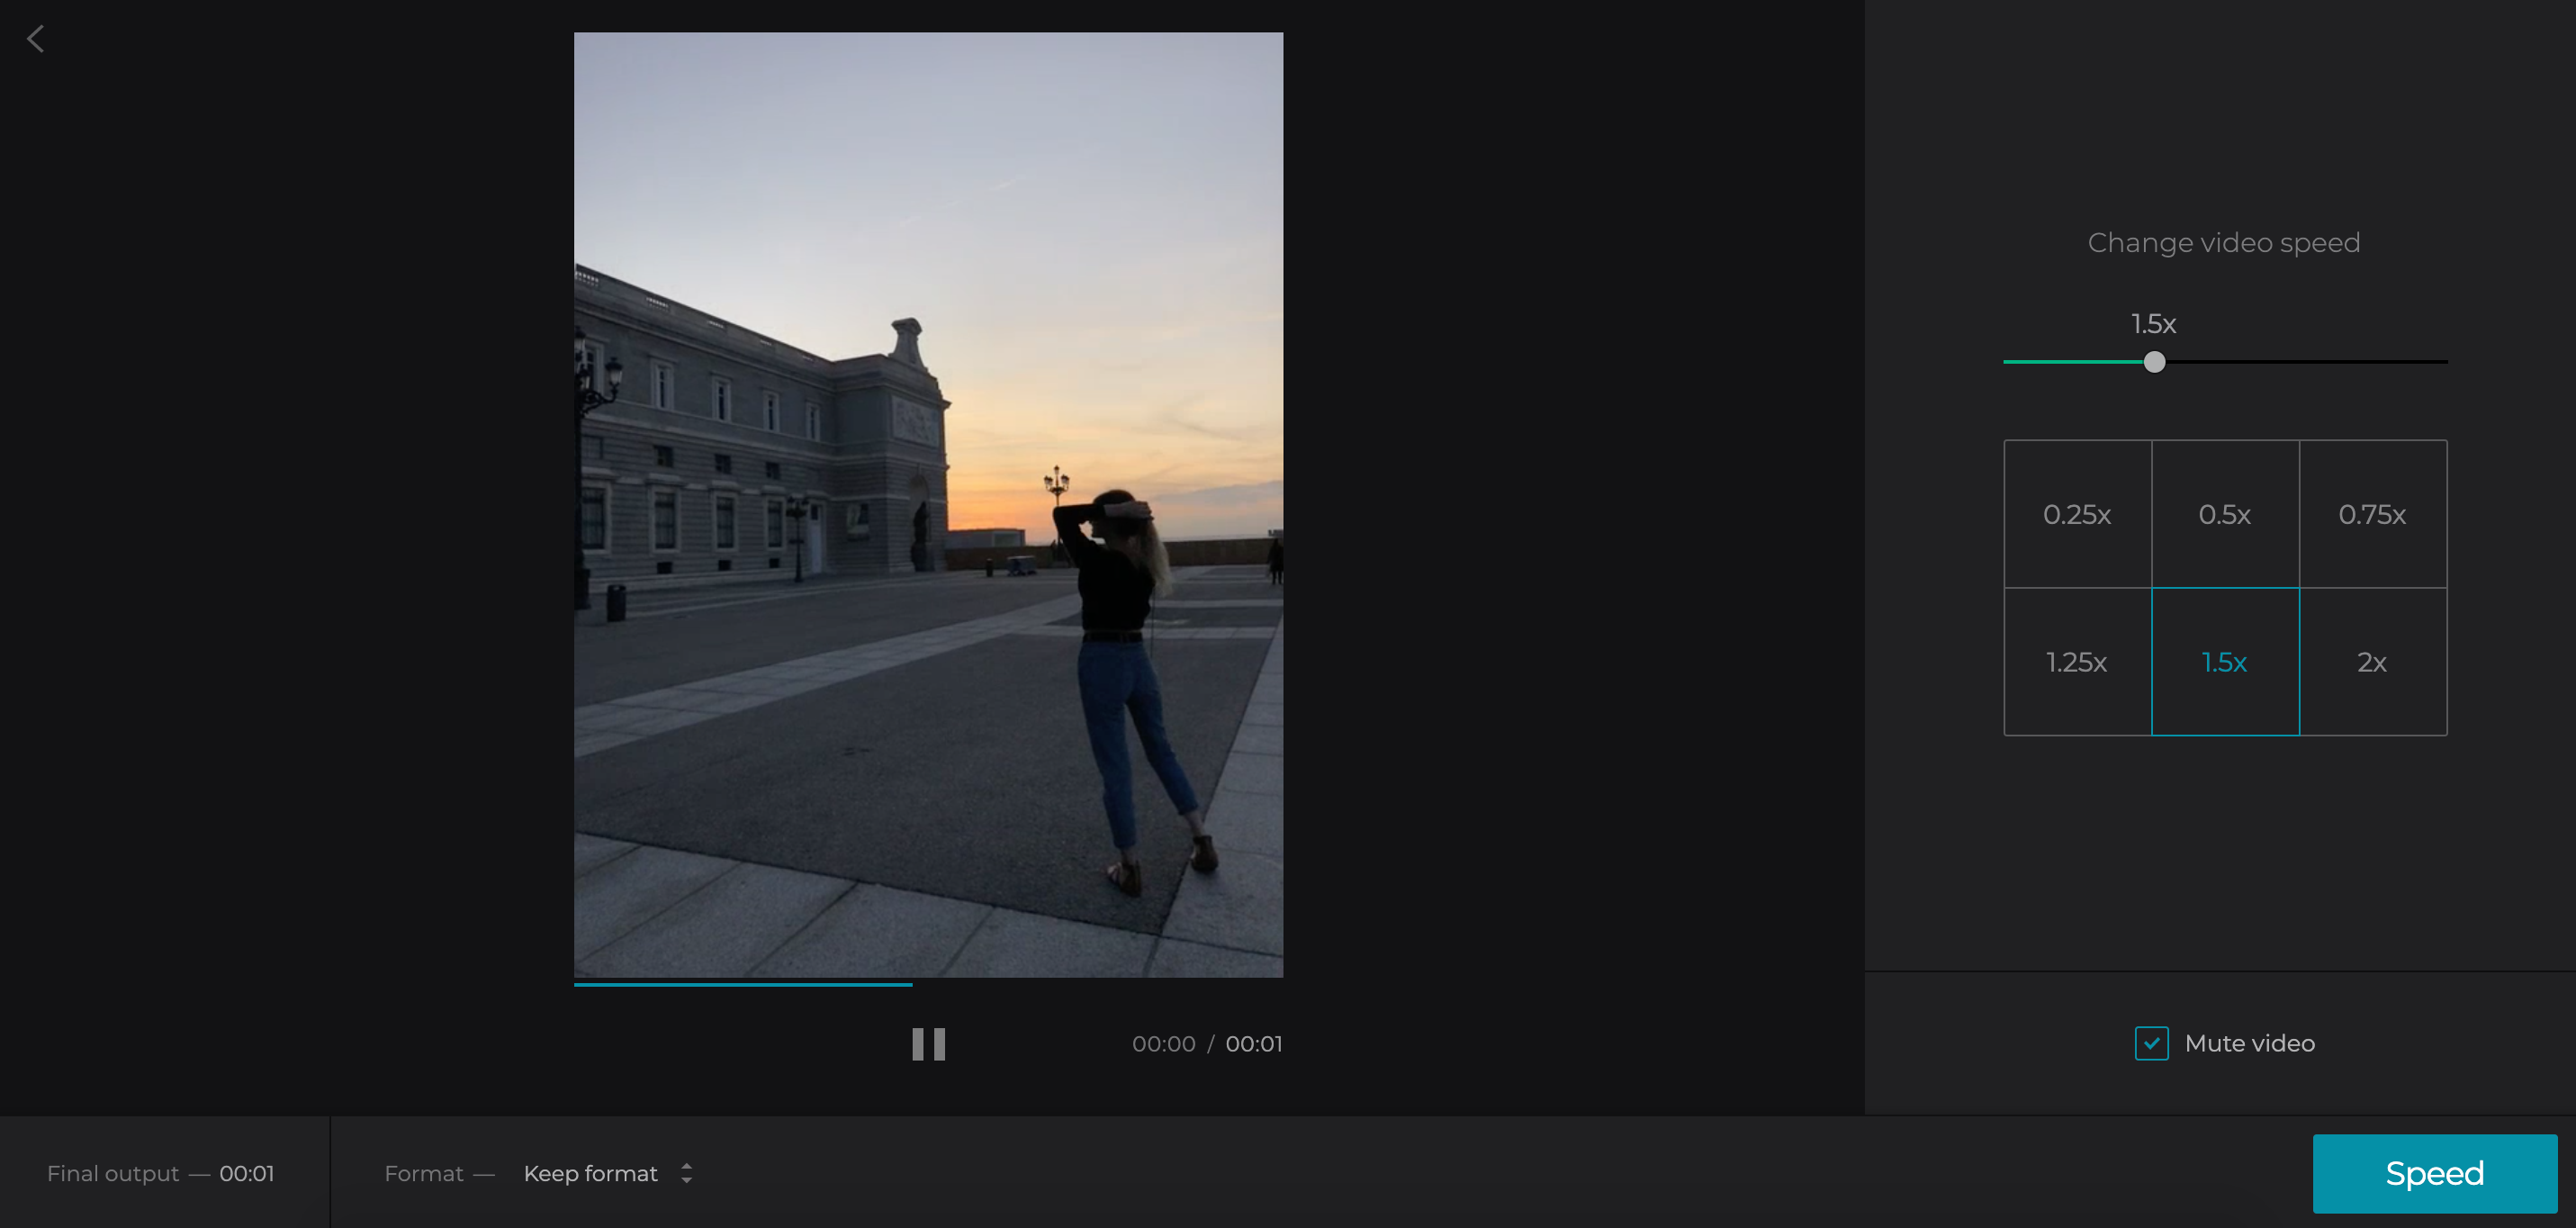 Speed up video on Windows 10